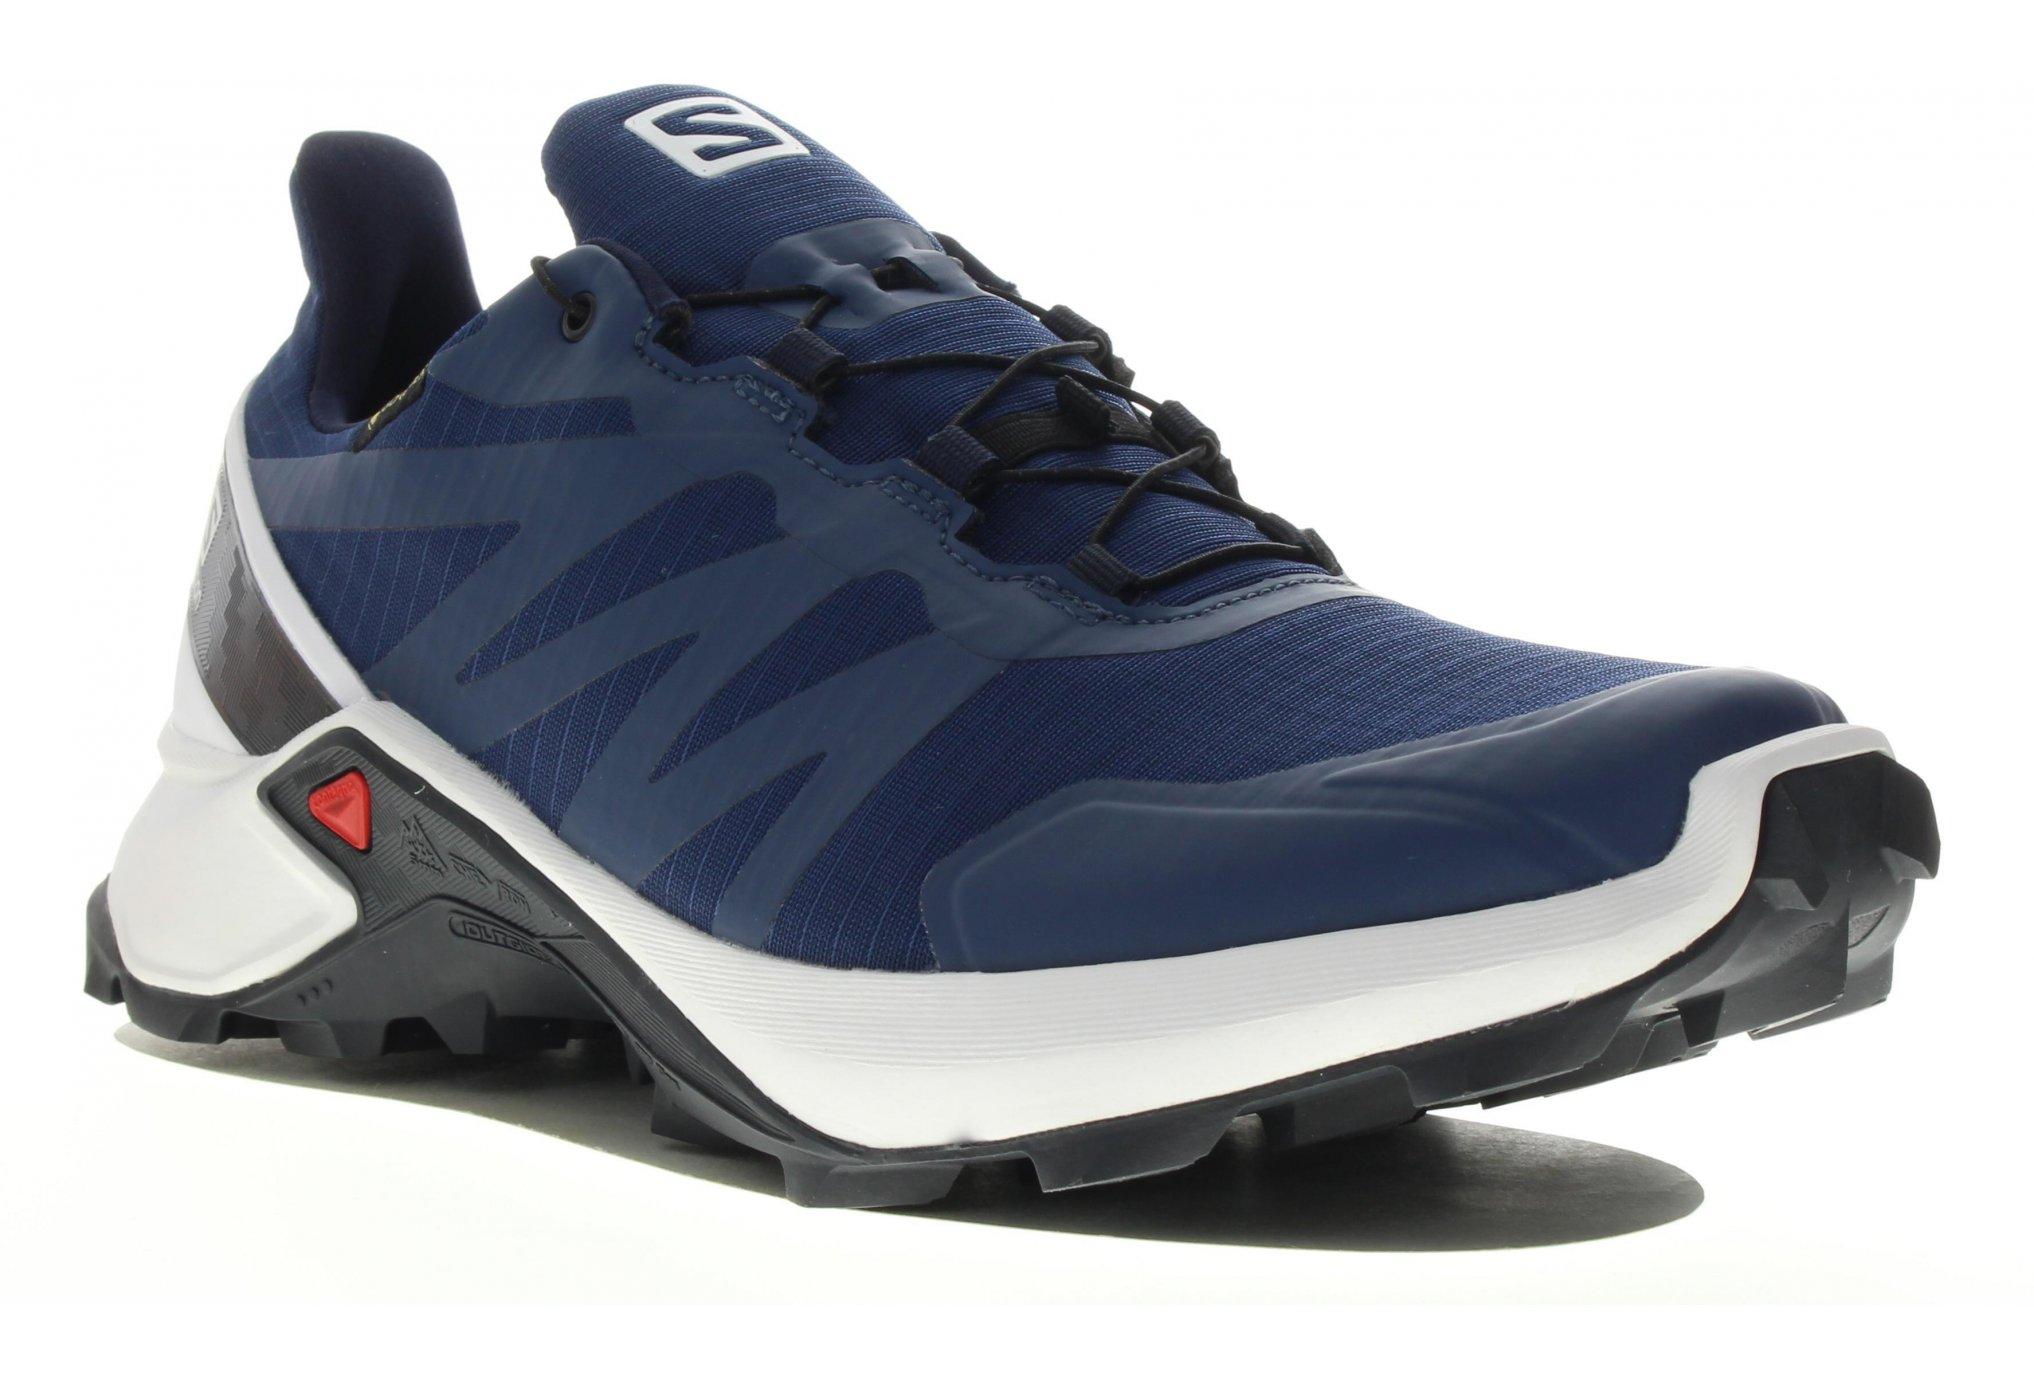 Salomon Supercrosss Gore-Tex Chaussures homme